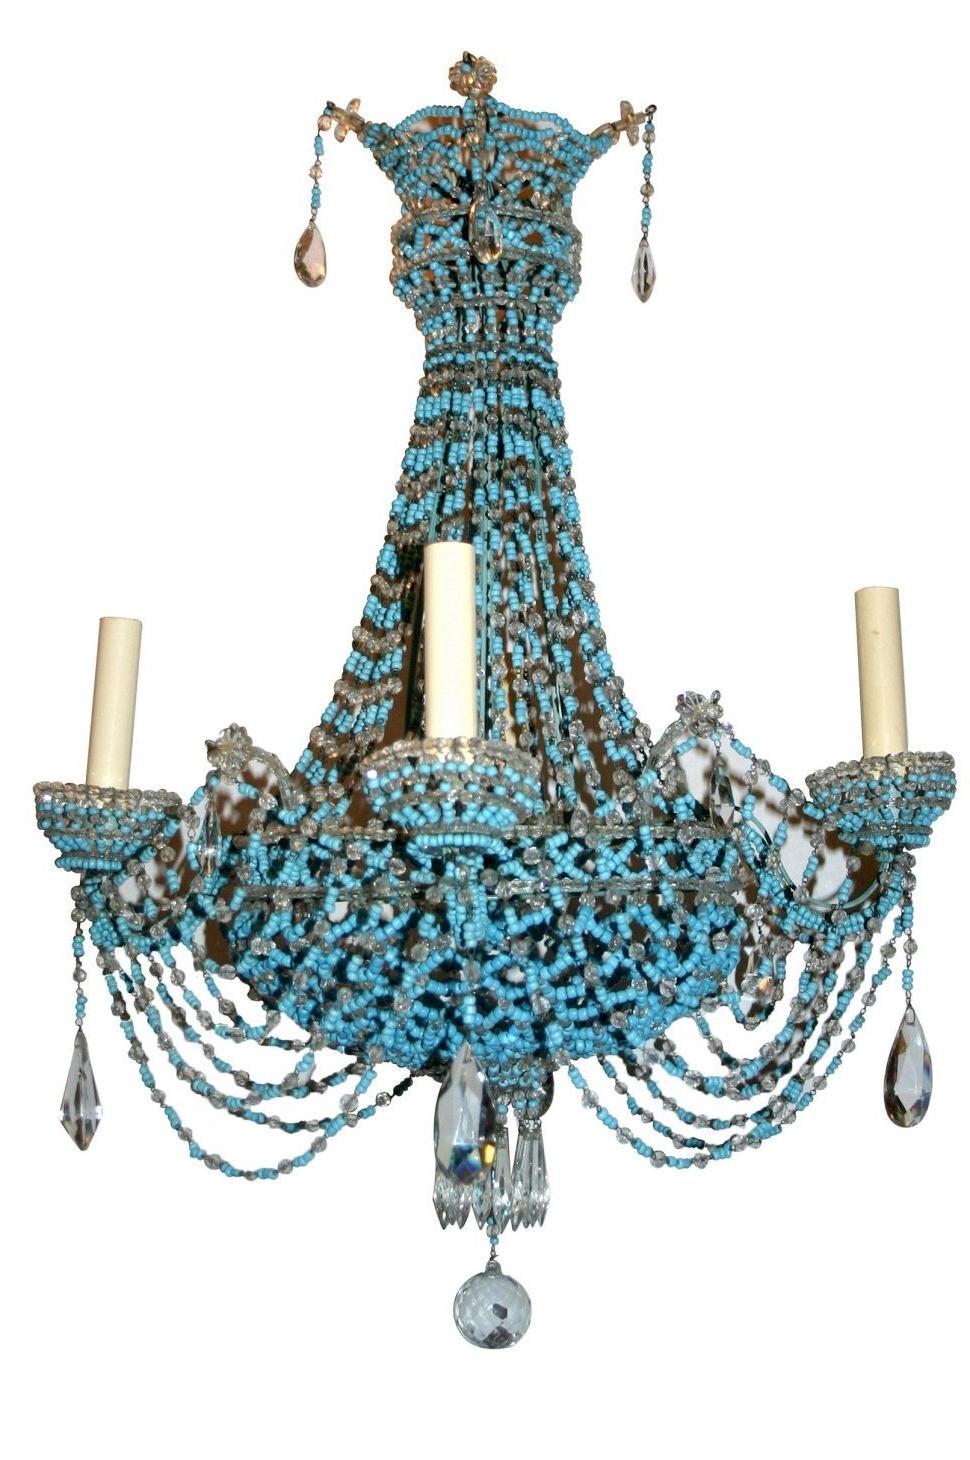 Preferred Turquoise Beaded Chandelier Light Fixtures In Lighting : Regina Andrew Turquoise Chandelier Light Wood Diy Small (Gallery 20 of 20)